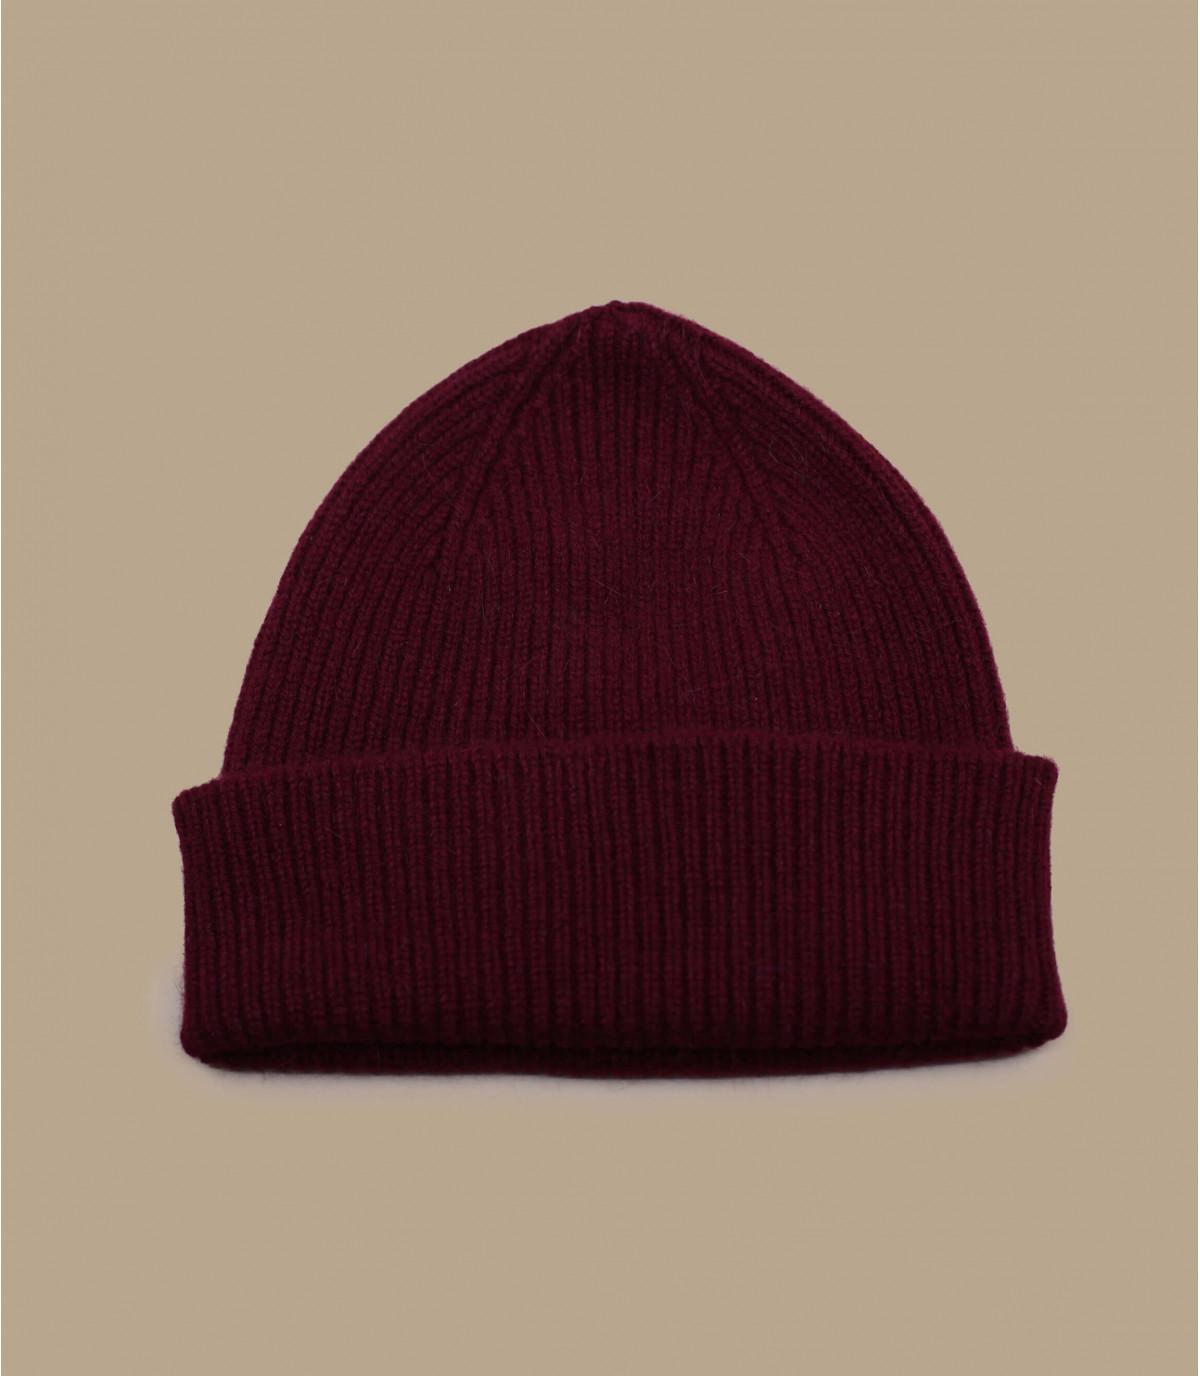 cappello bavero bordeaux angora